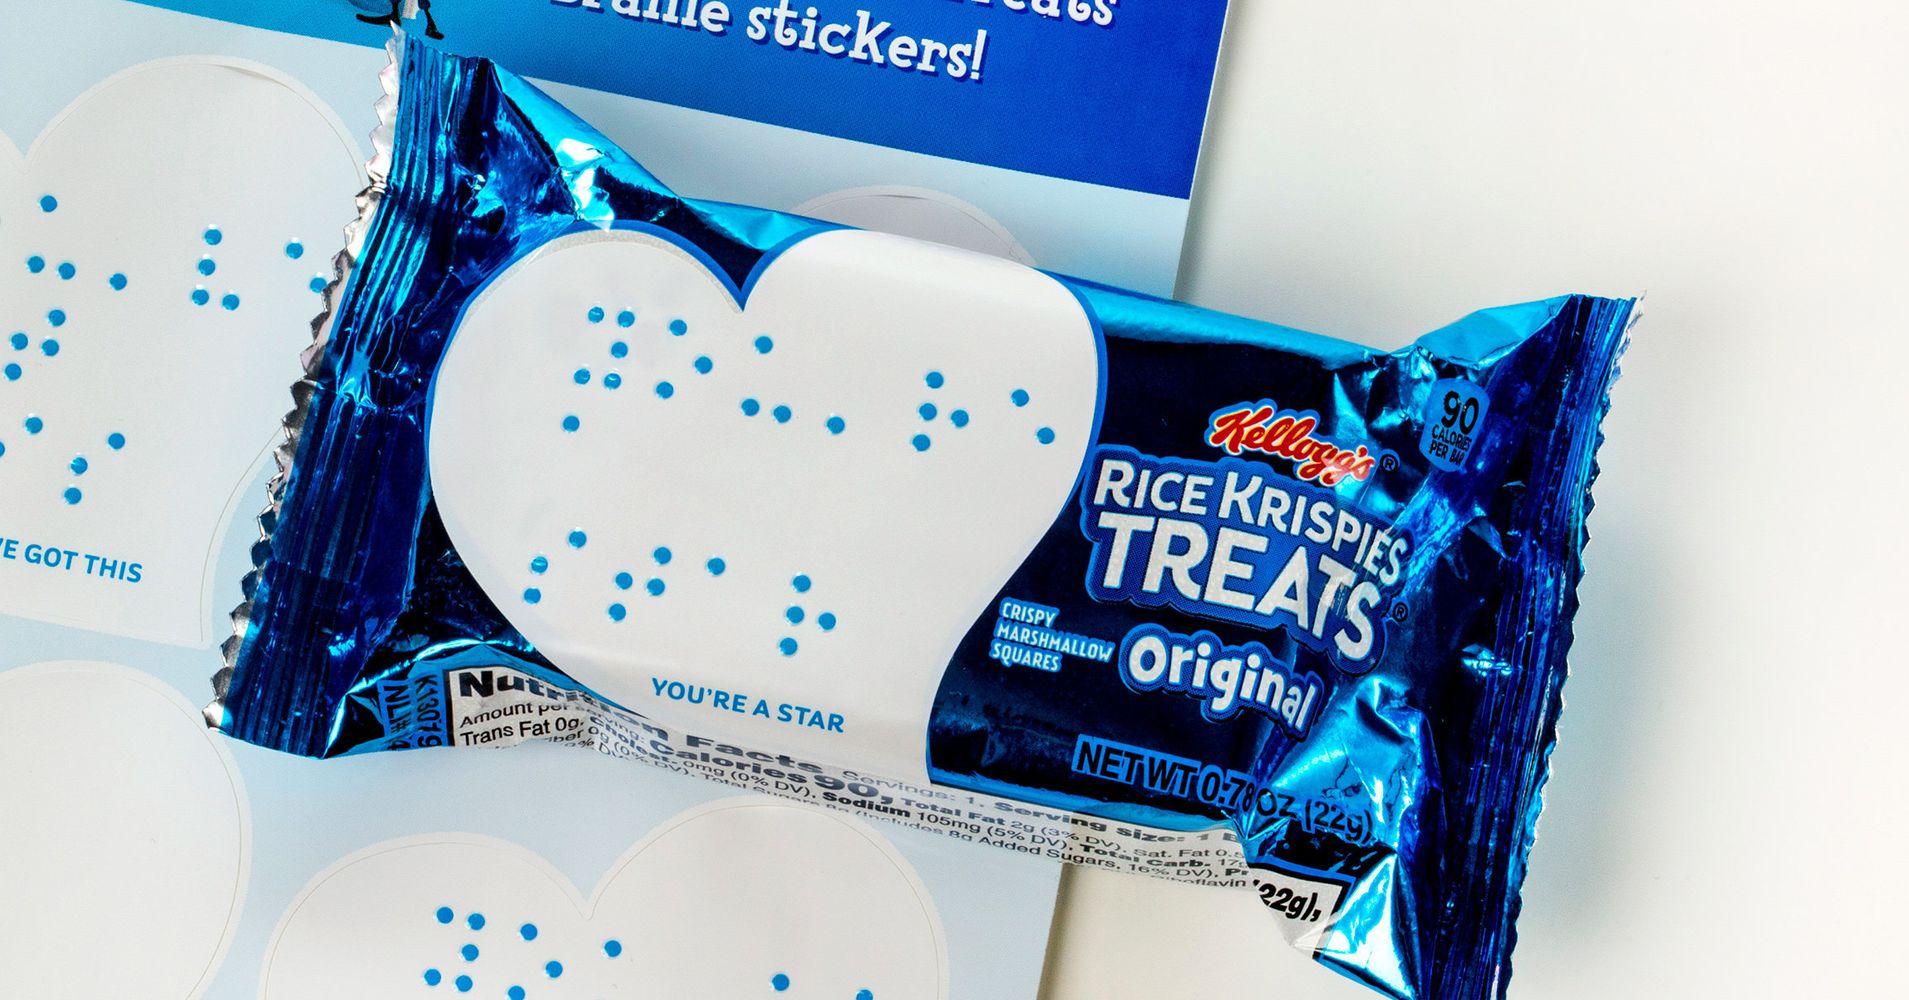 Rice krispies treats just took a real step toward inclusivity huffpost life